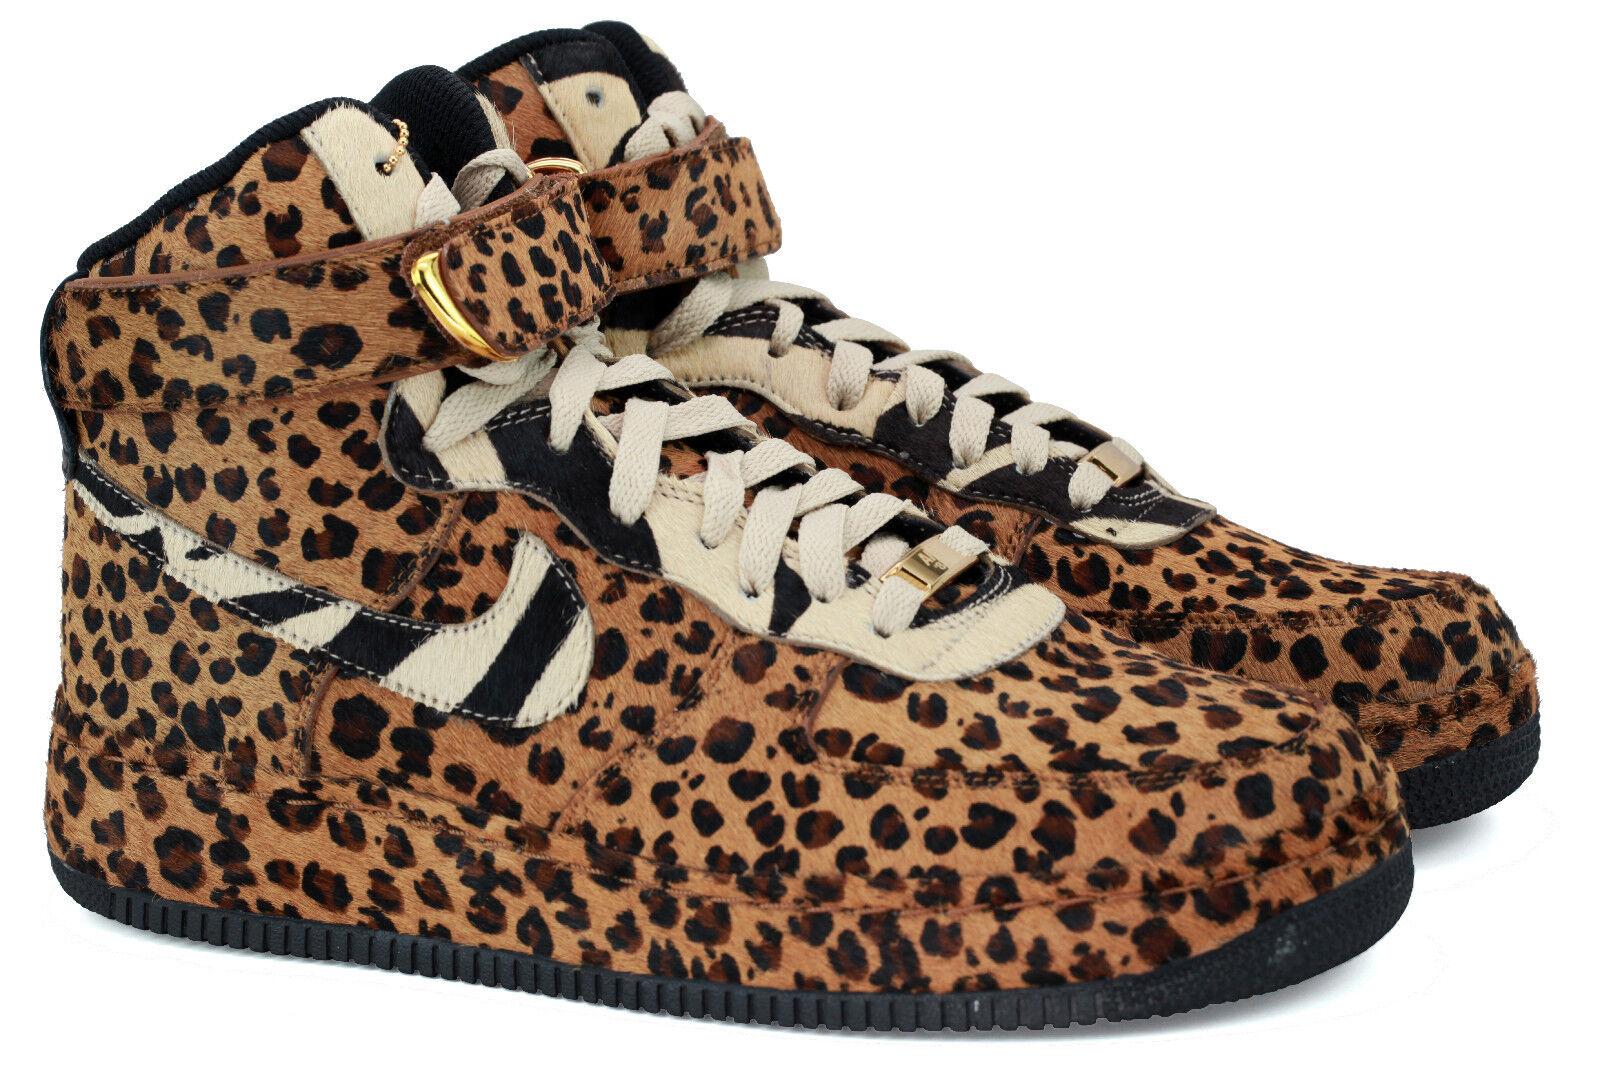 RARE Nike Air Force 1 High Poleberg X Hanni Collab AF1 Bespoke Supreme Leopard